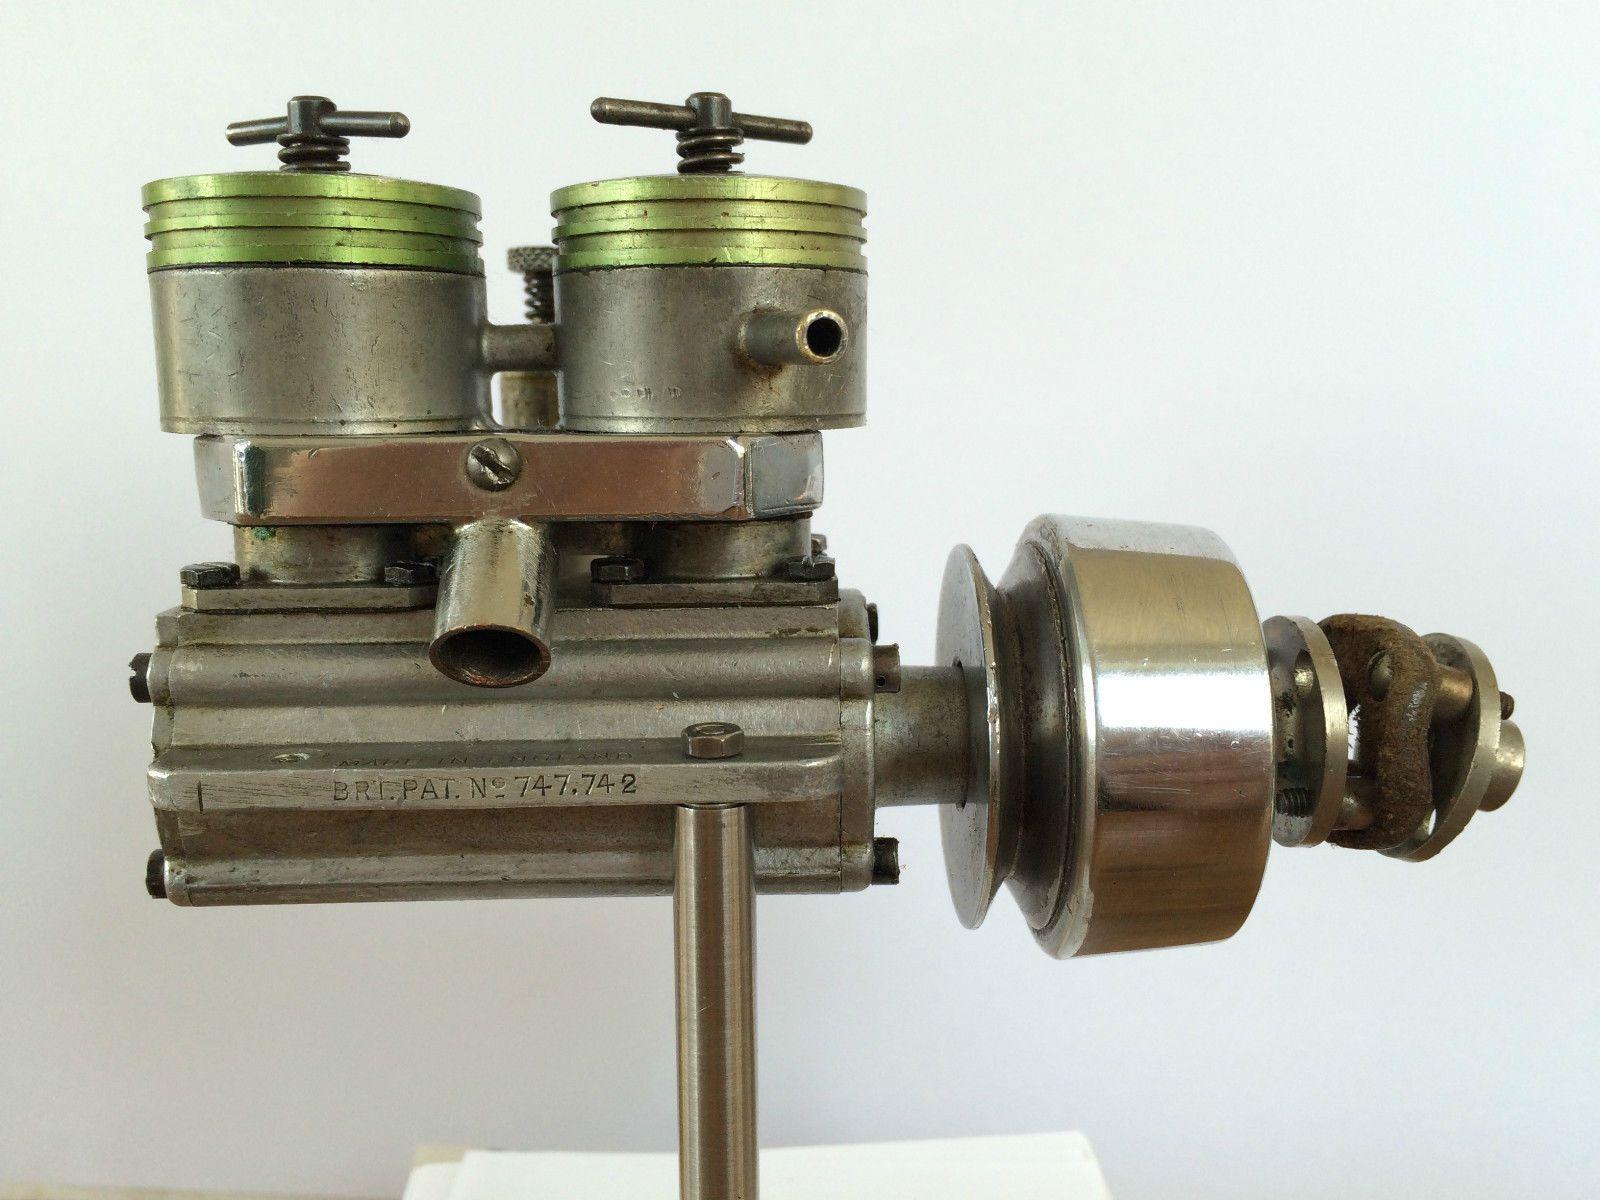 Taplin Twin 5 ccm 2 Zylinder Reihenmotor